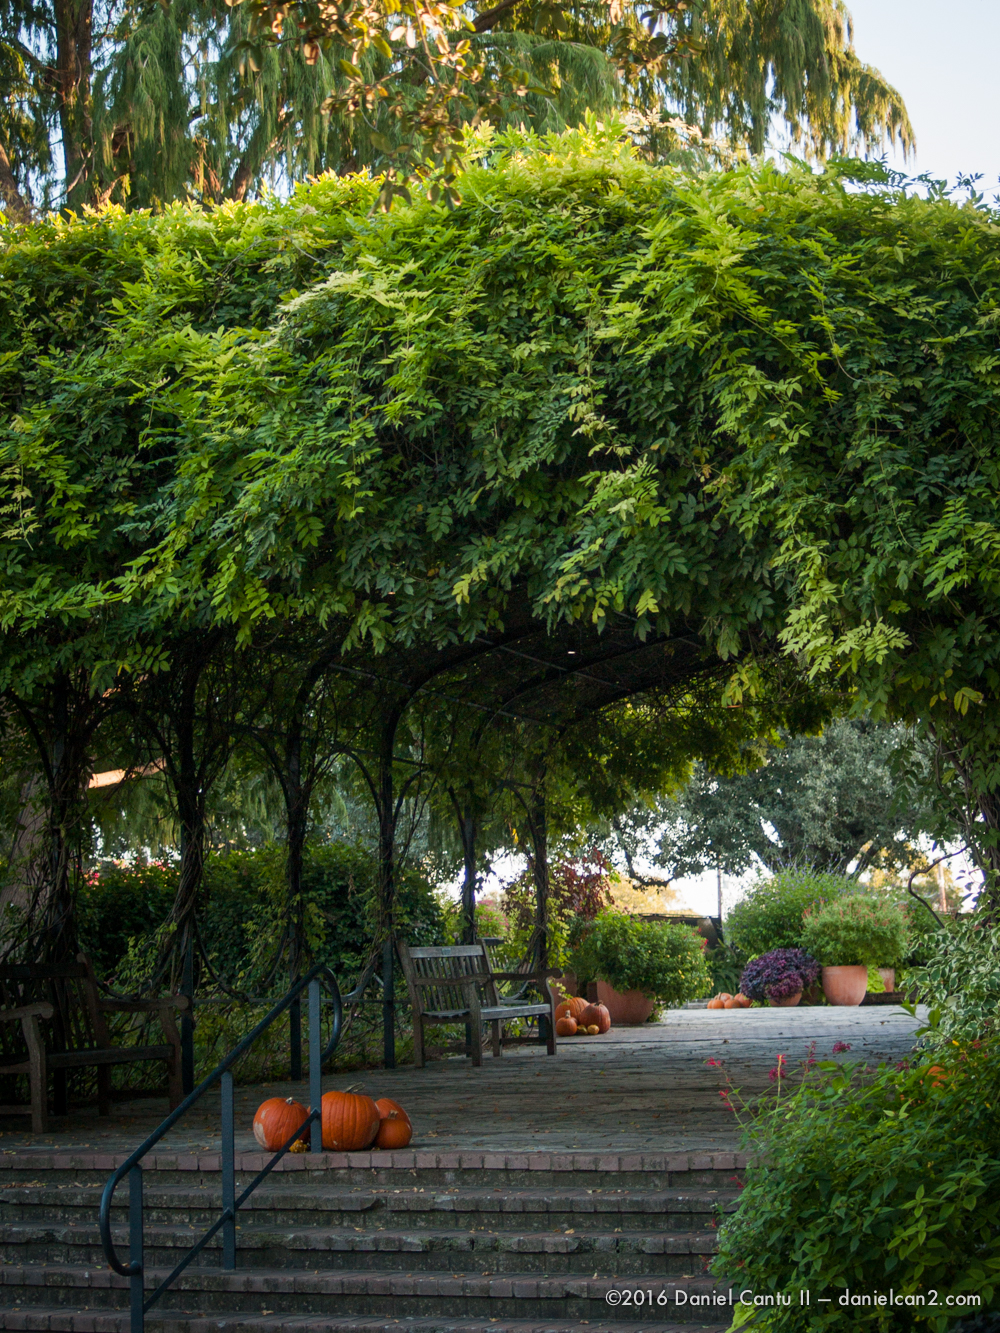 Daniel-Cantu-II-Botanical-Gardens-Oct-2016-53.jpg